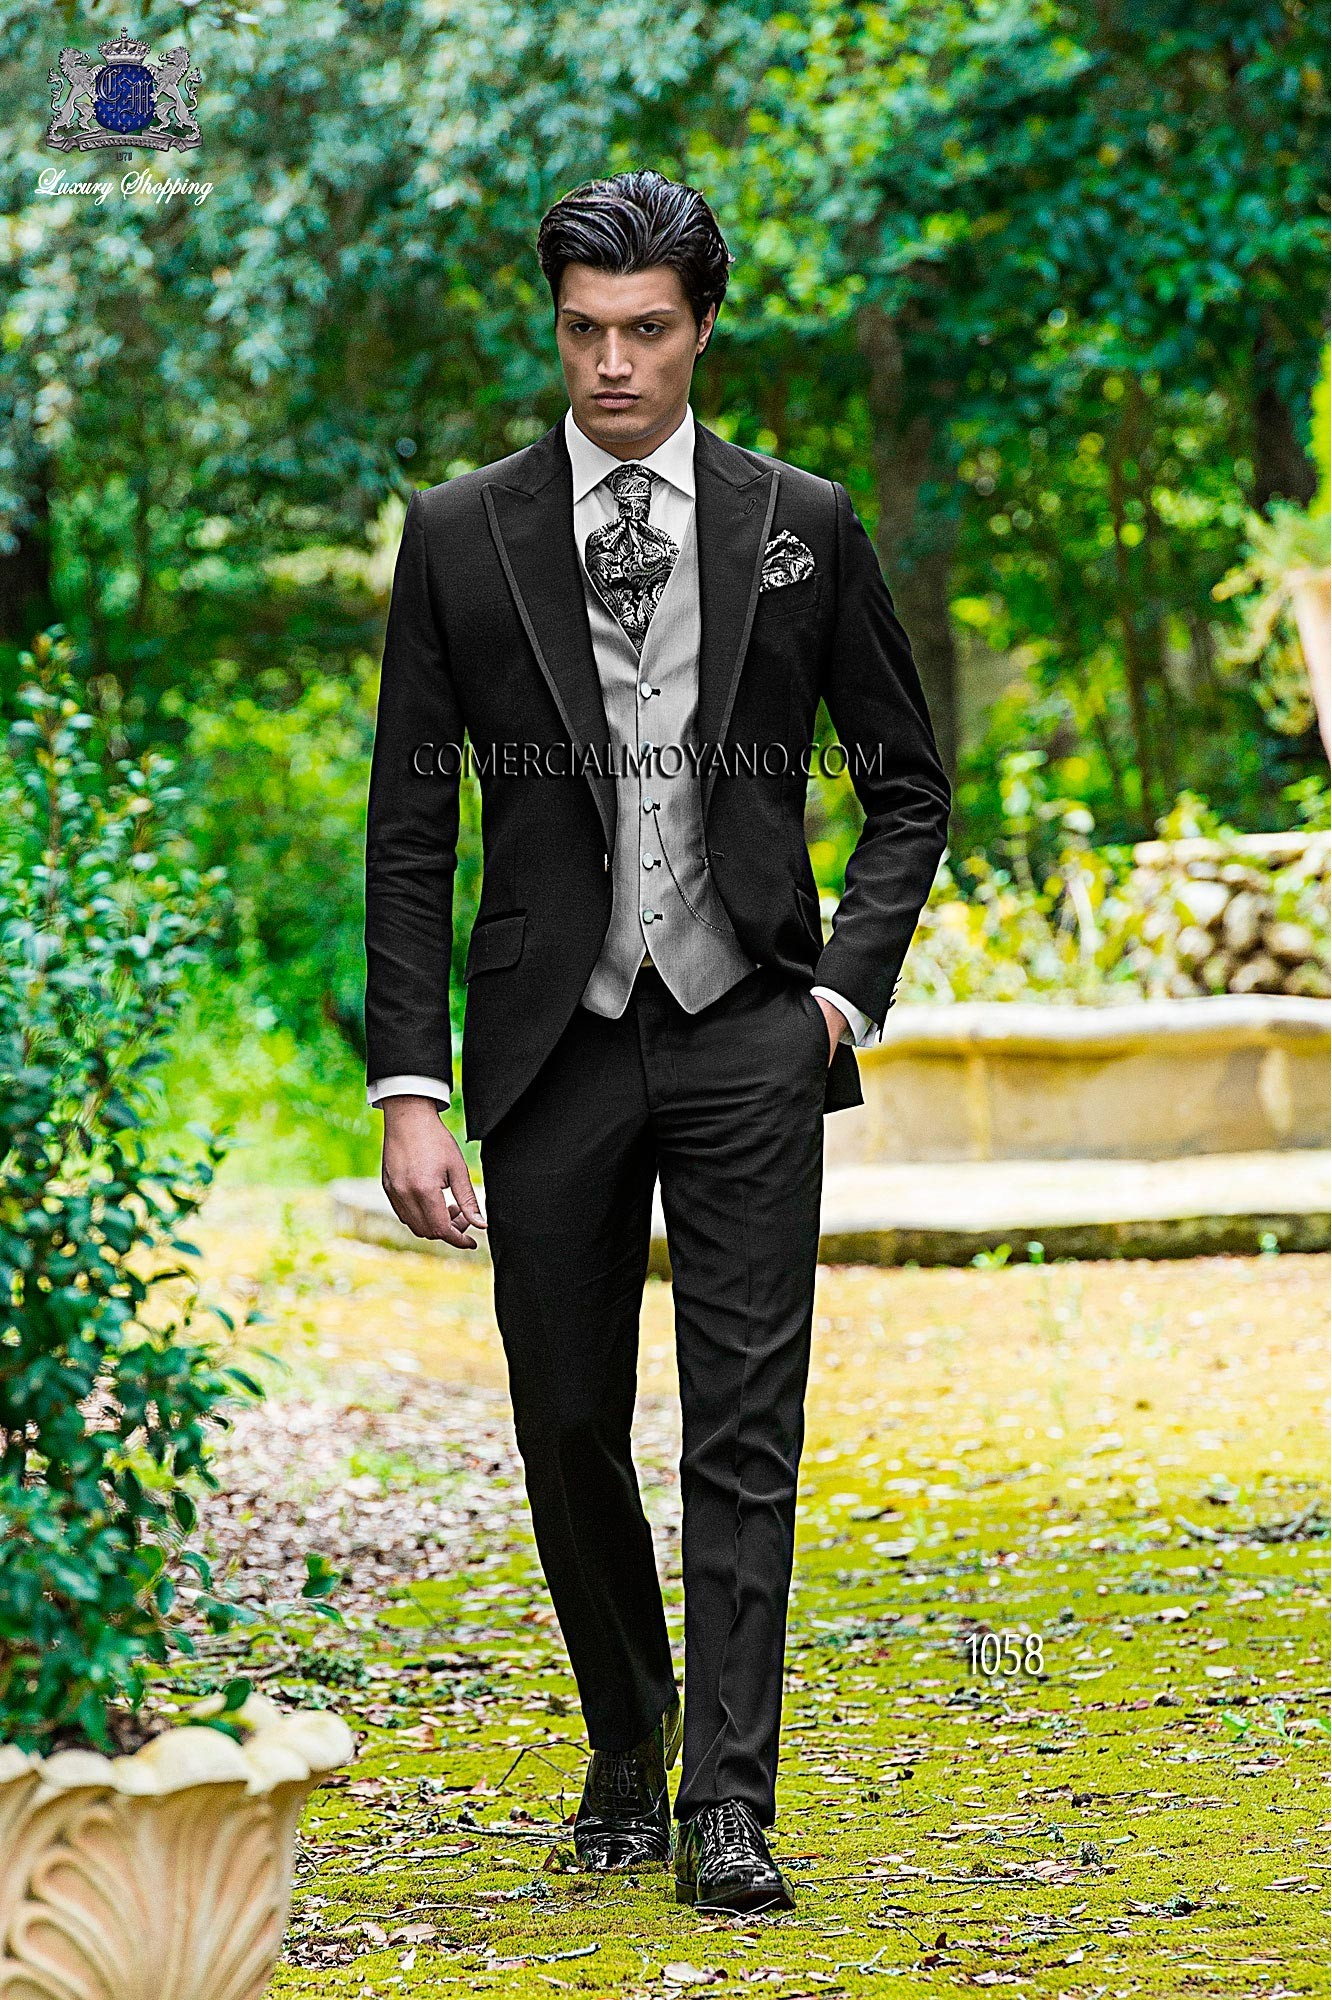 Traje de novio moderno negro modelo: 1058 Ottavio Nuccio Gala colección Fashion